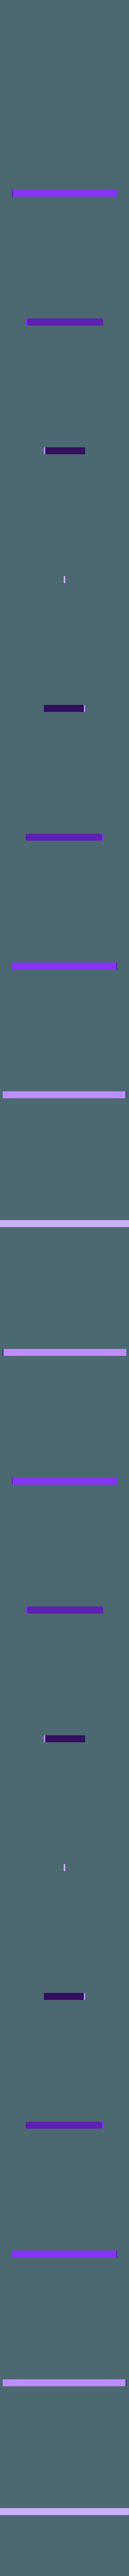 Connecteur20.stl Download free STL file Modular reminder • 3D print template, rfbat